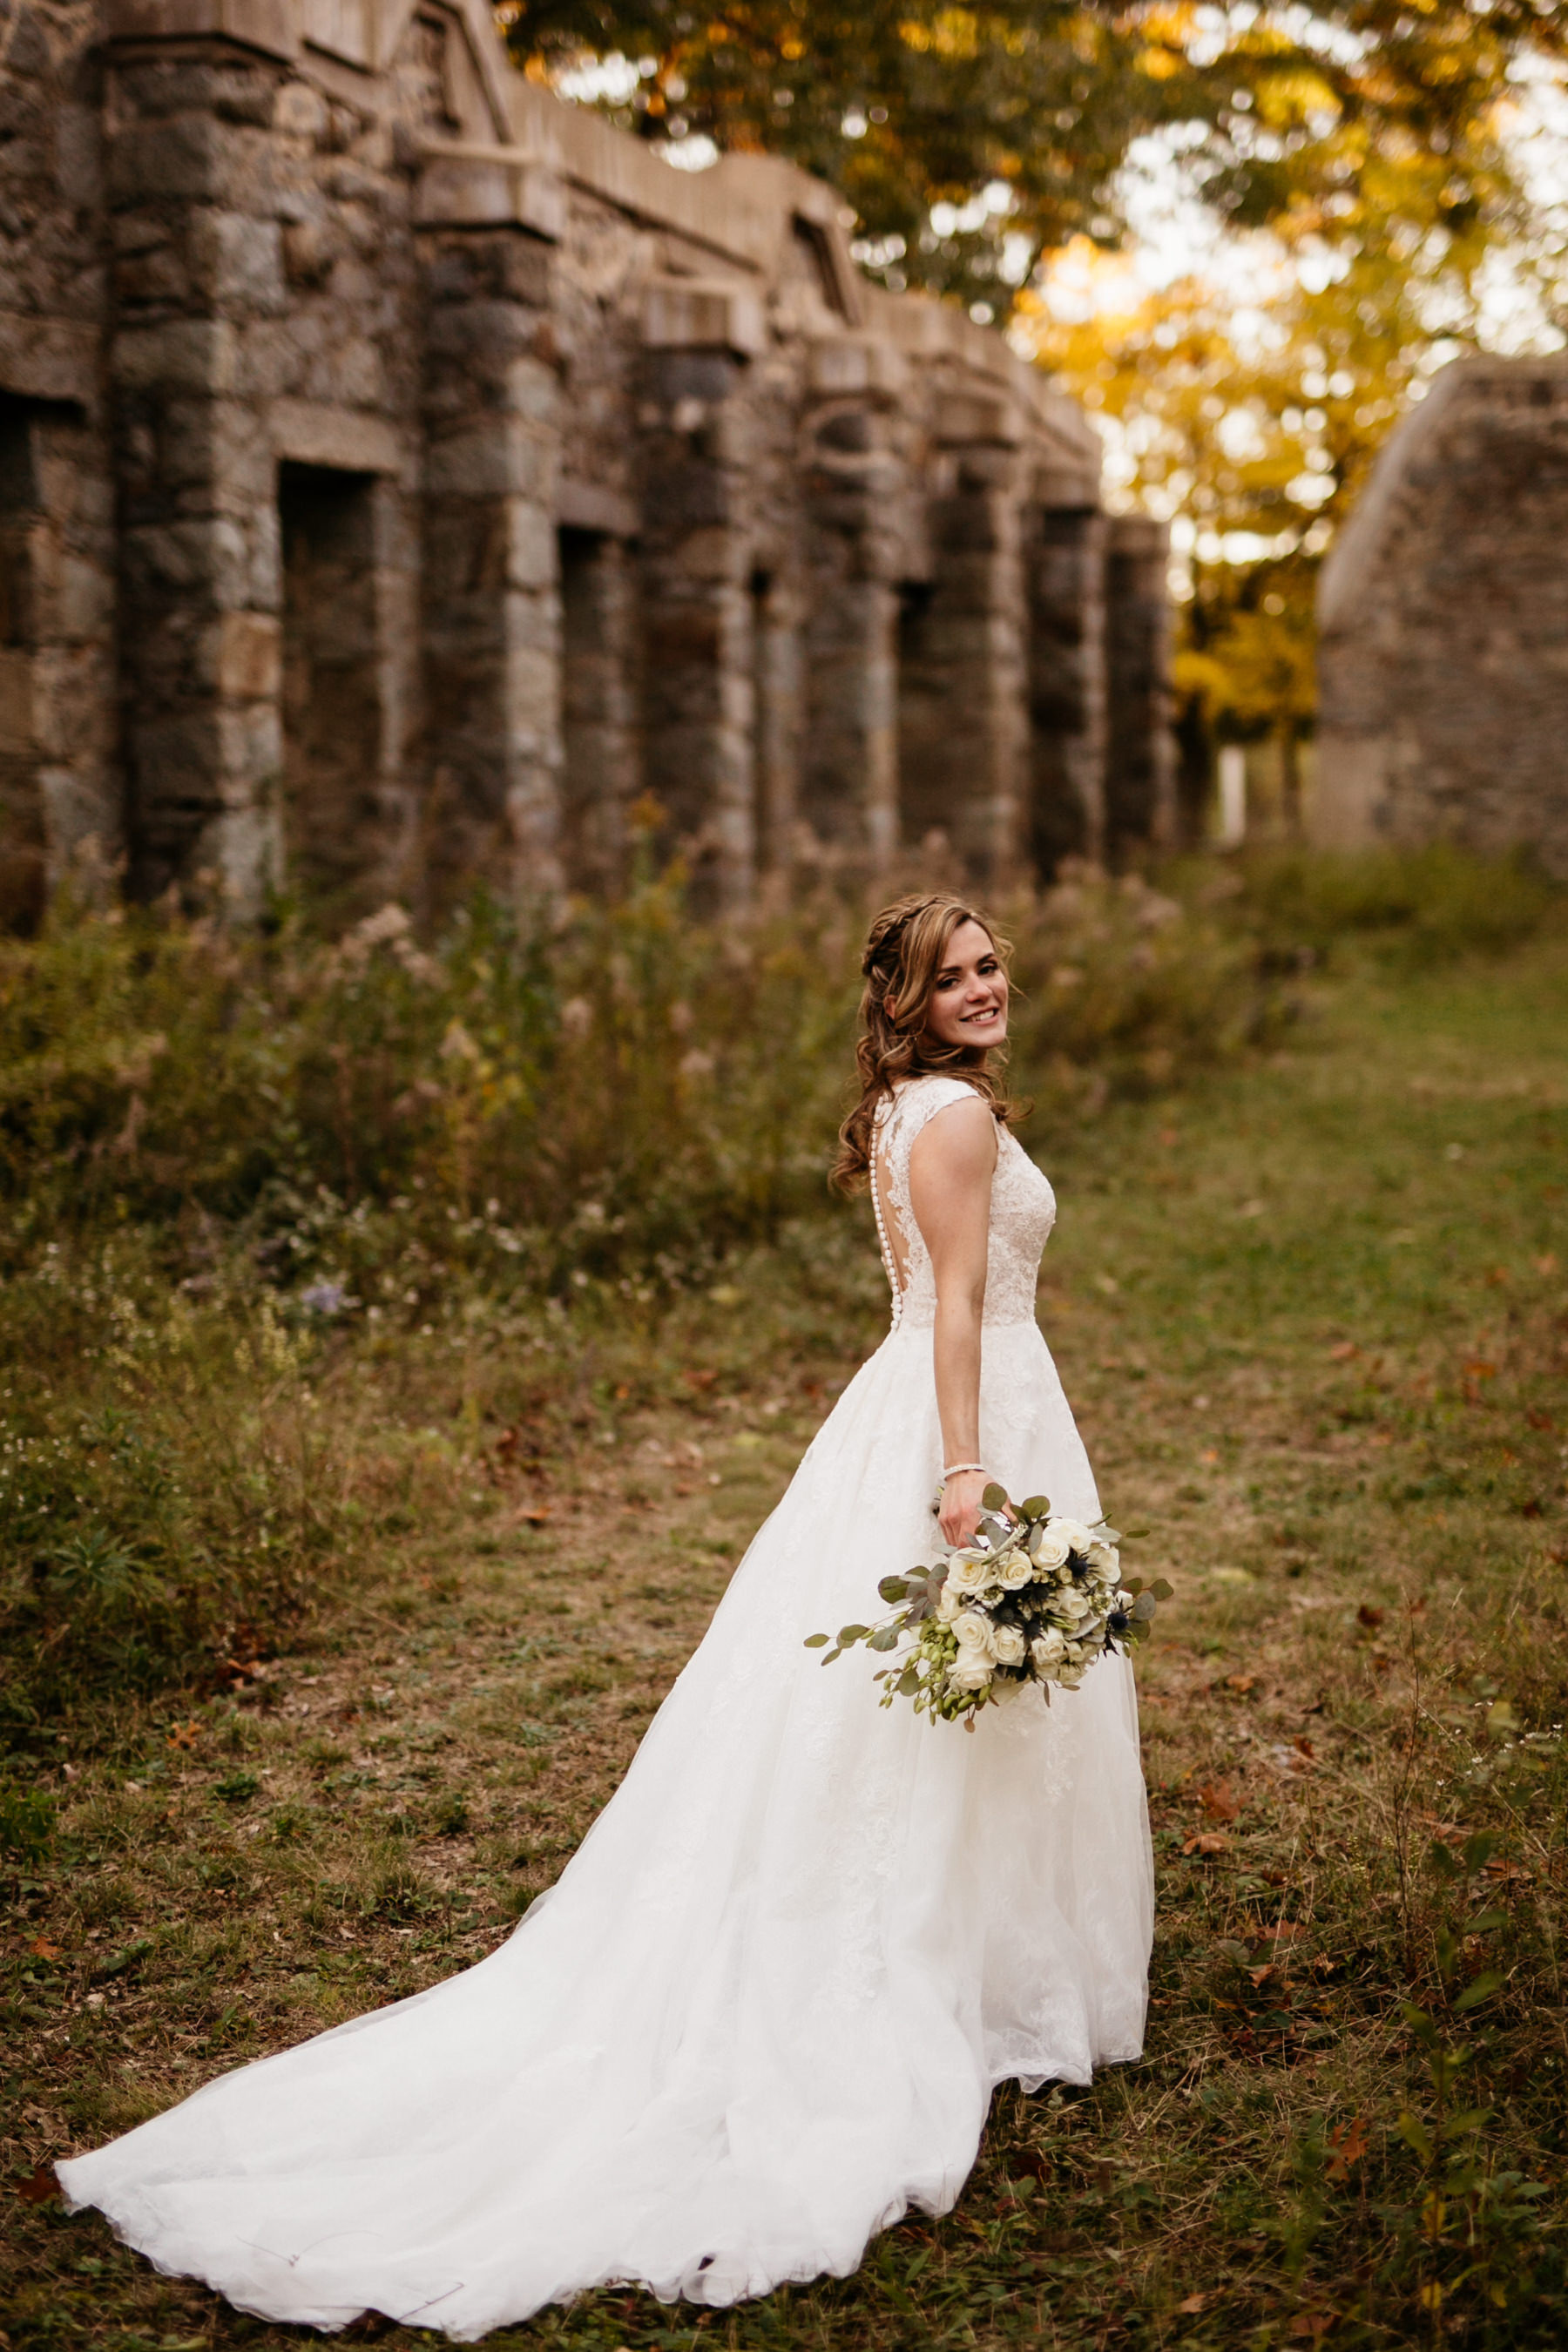 Quincy Ma Massachusetts Wedding Dedham Boston Granie Links Wedding New England Catholic Cathedral Liz Osban Photography 75.jpg